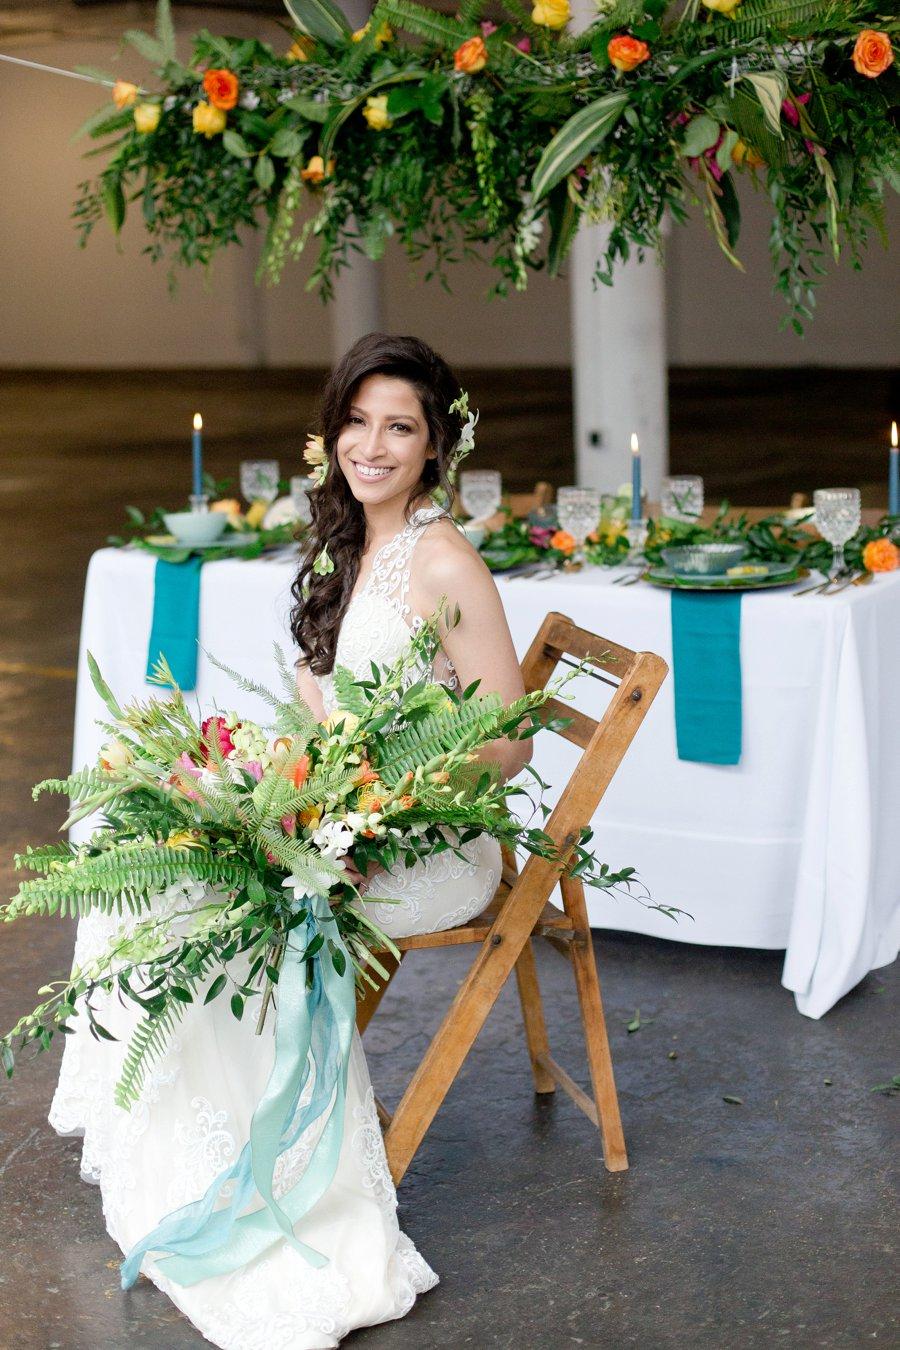 Modern & Lush Tropical Wedding Ideas via TheELD.com